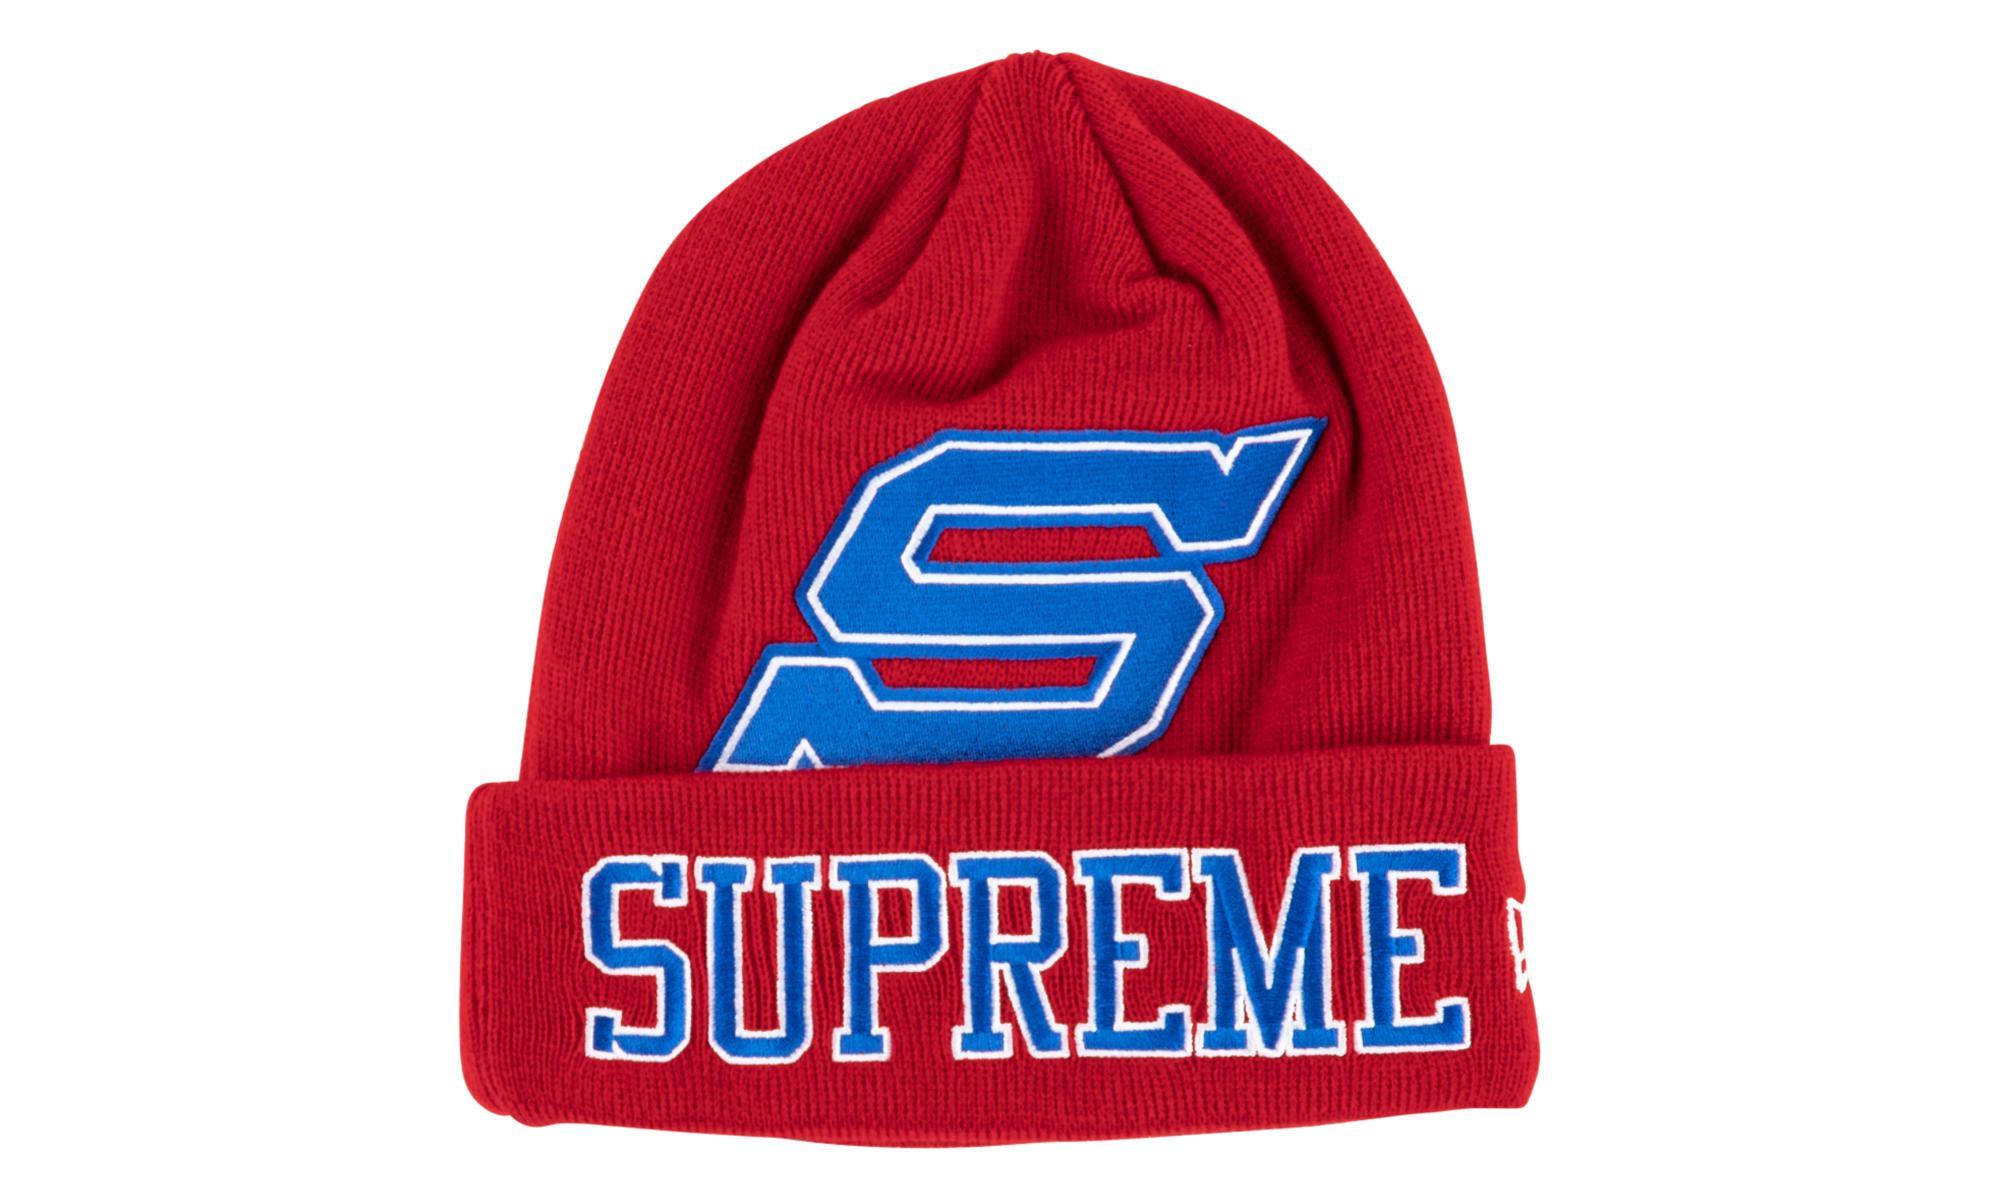 c030edb3a36 Supreme - Red New Era Big S Beanie for Men - Lyst. View fullscreen